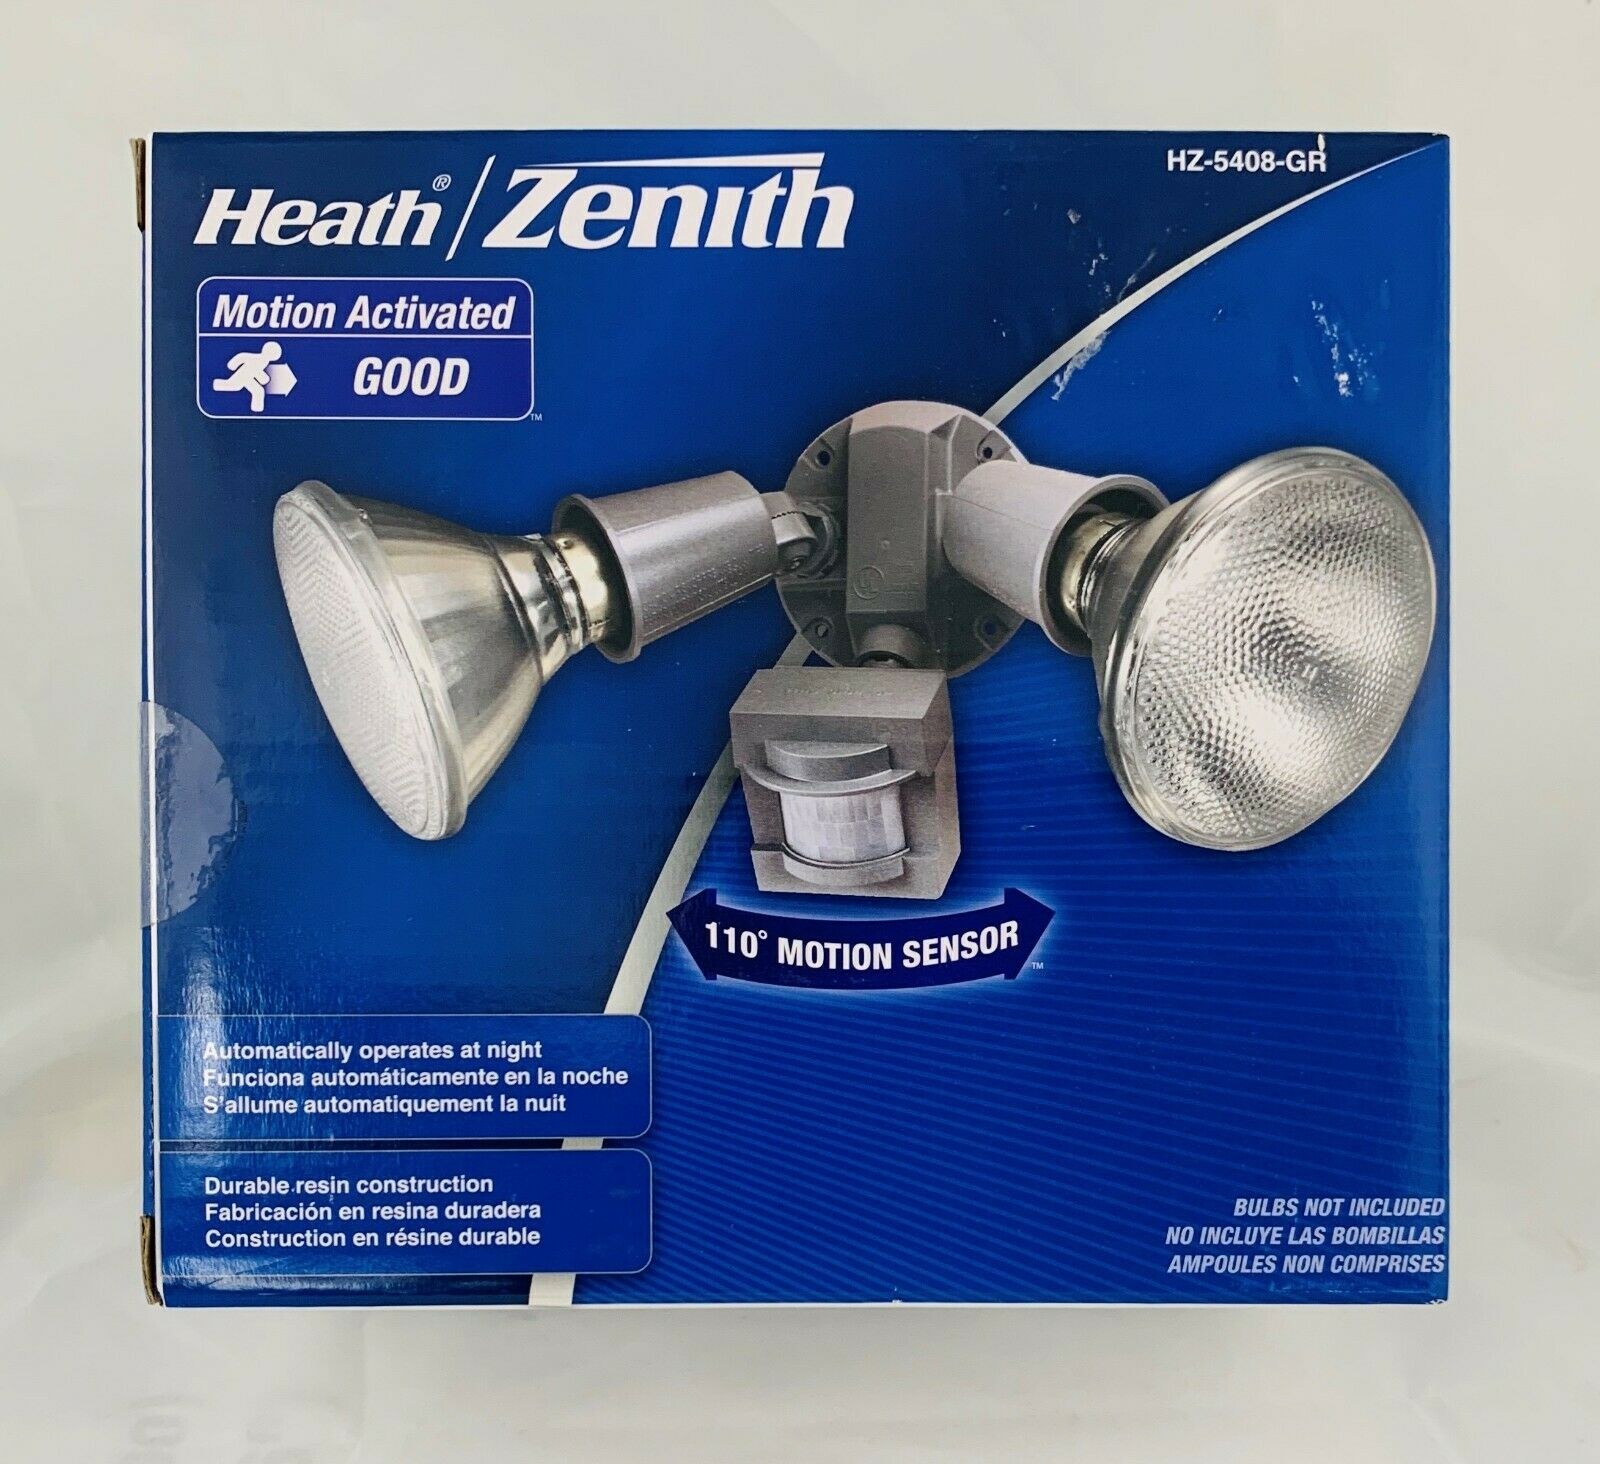 Heath Zenith Sl 5630 Bz D 180 Degree Halogen Motion Sensing Security Light For Sale Online Ebay